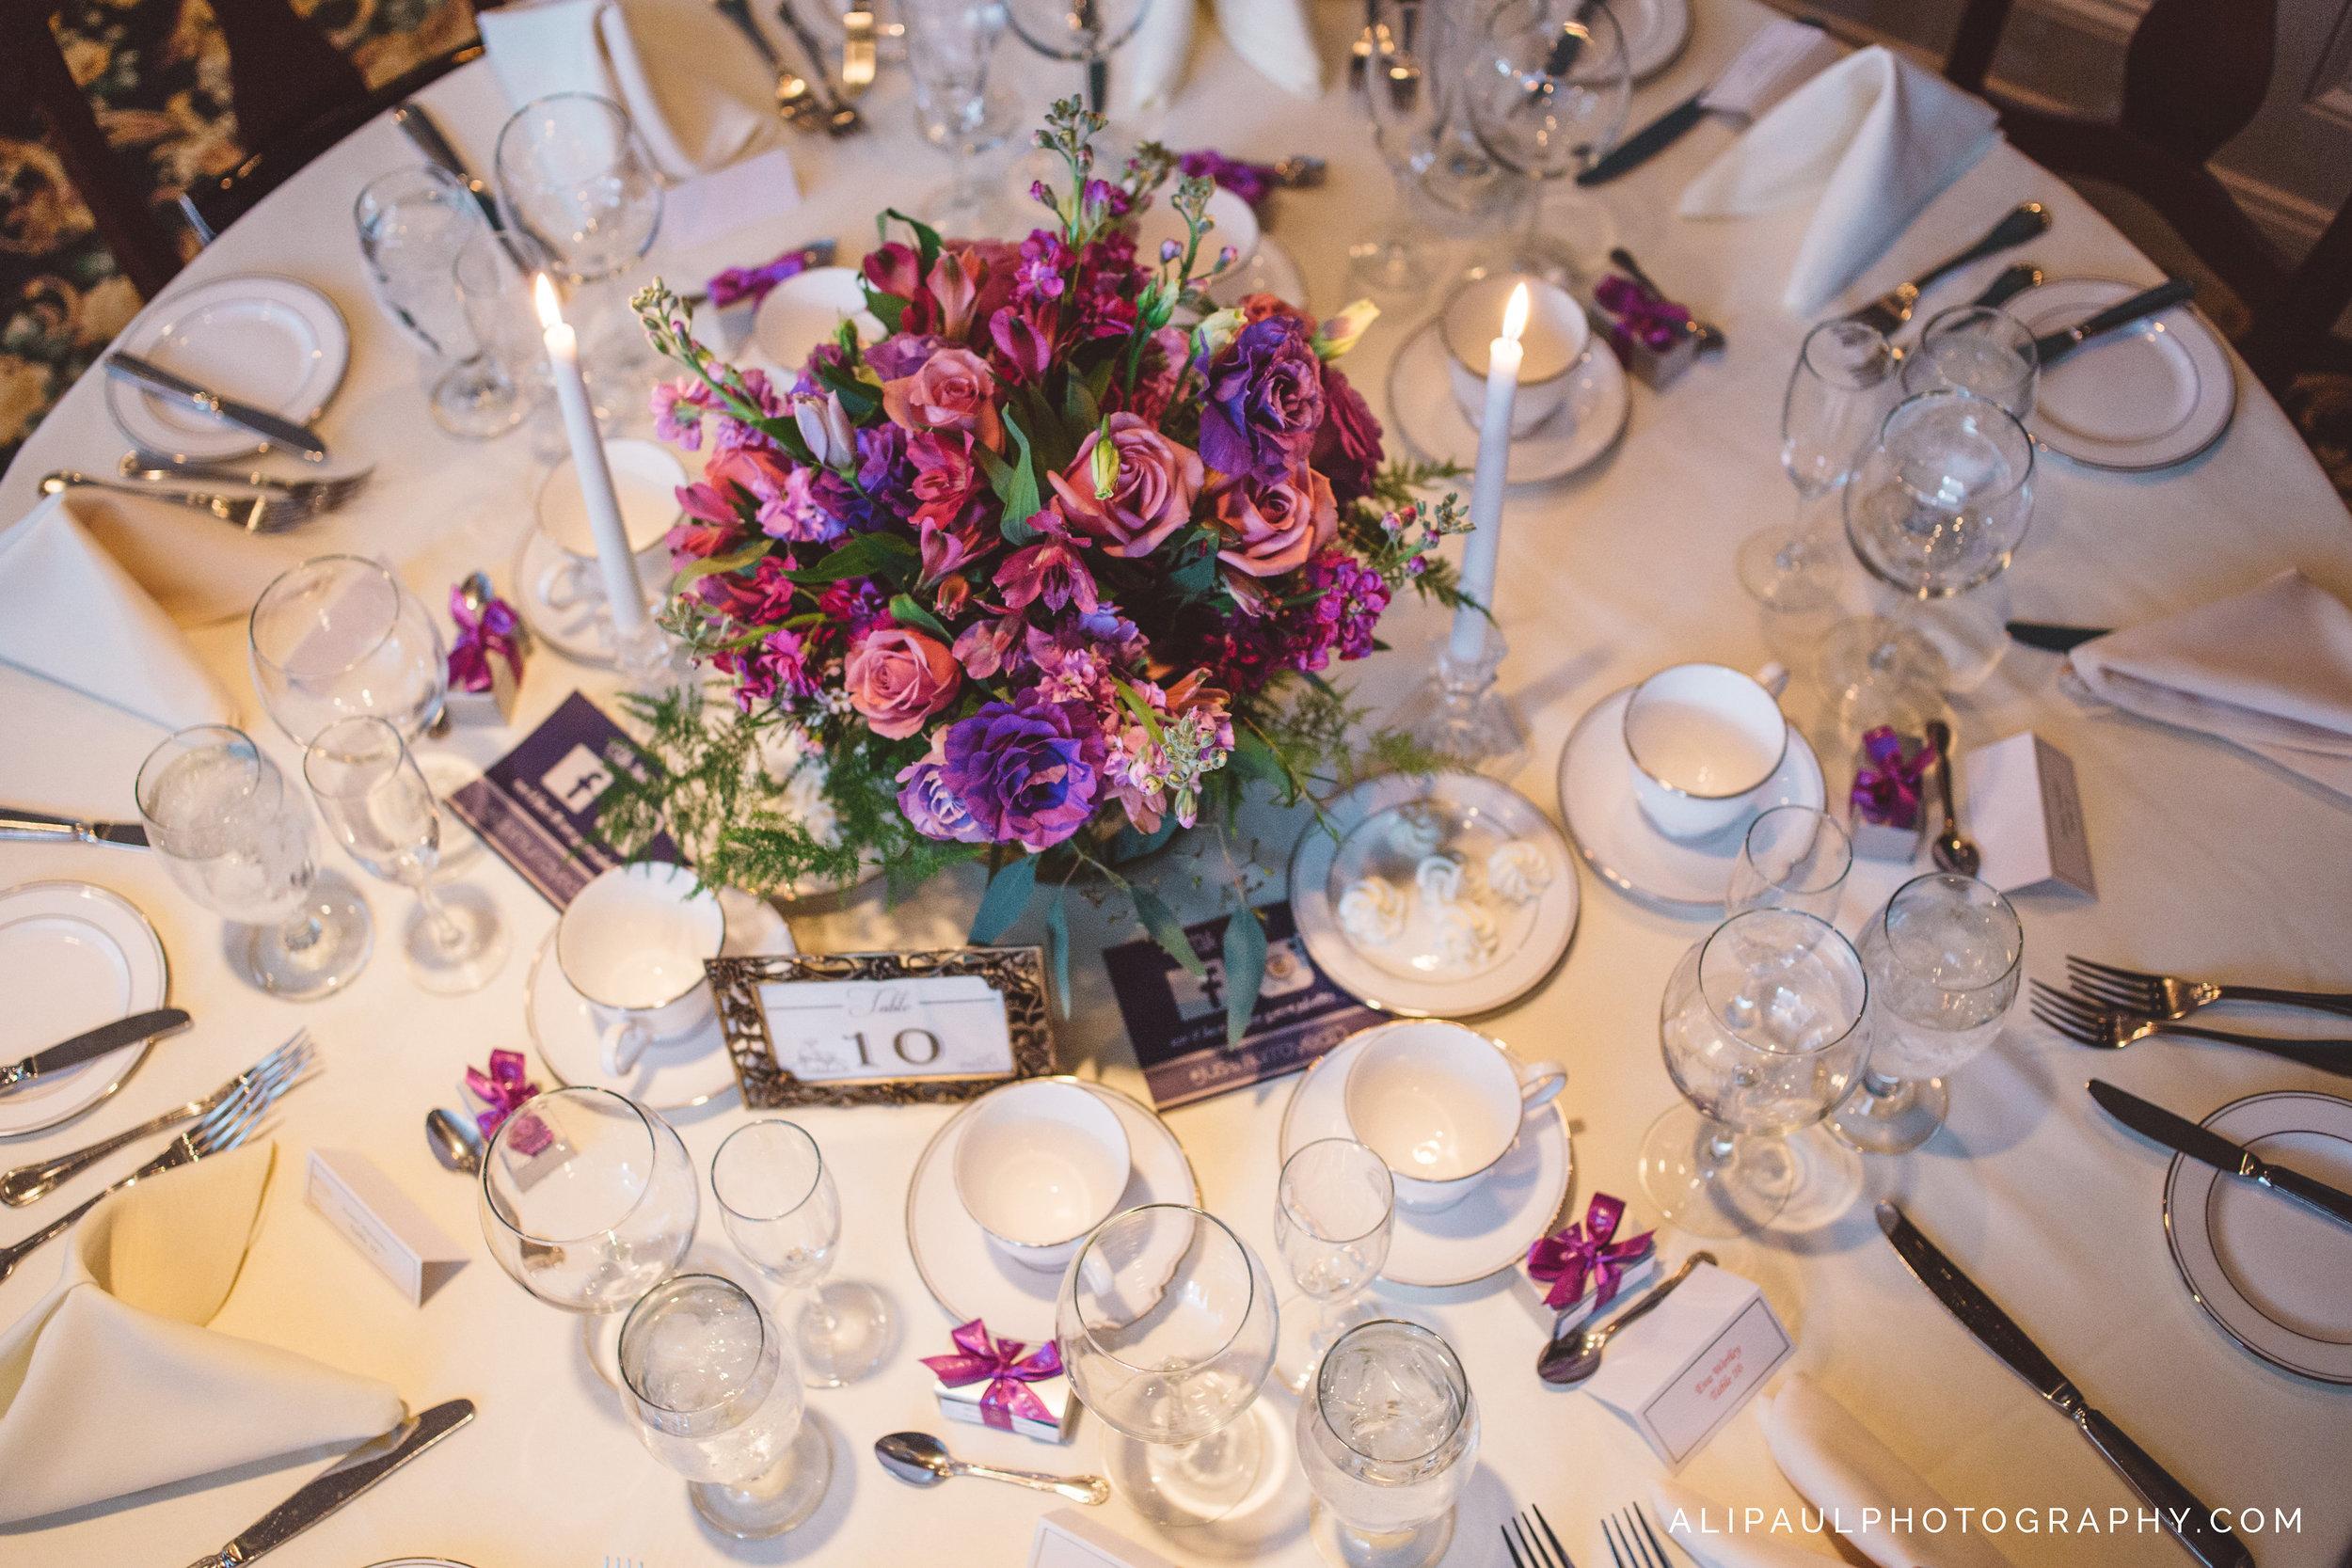 WEDDIGN TABLE